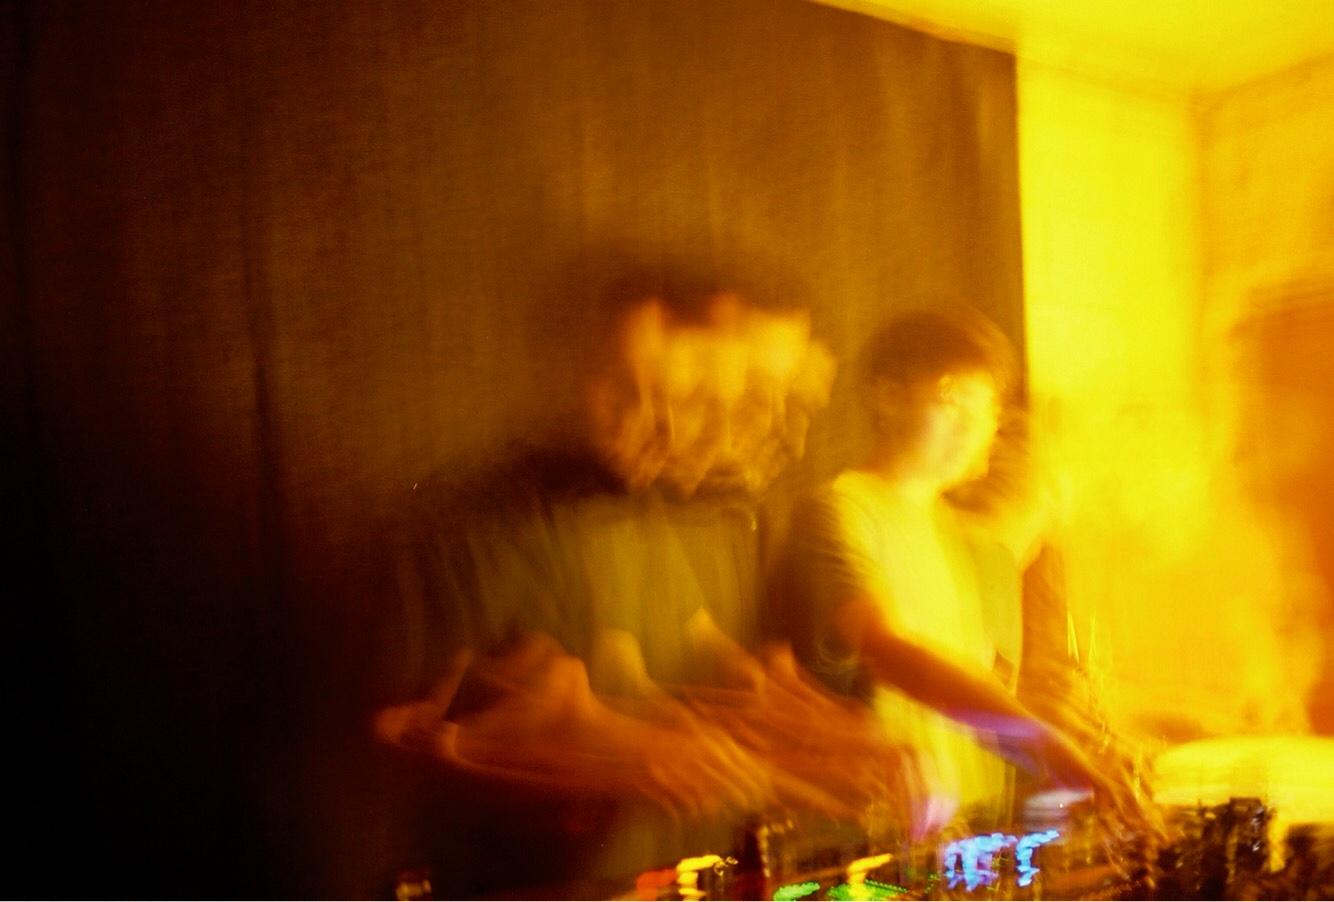 Control Freak Recordings